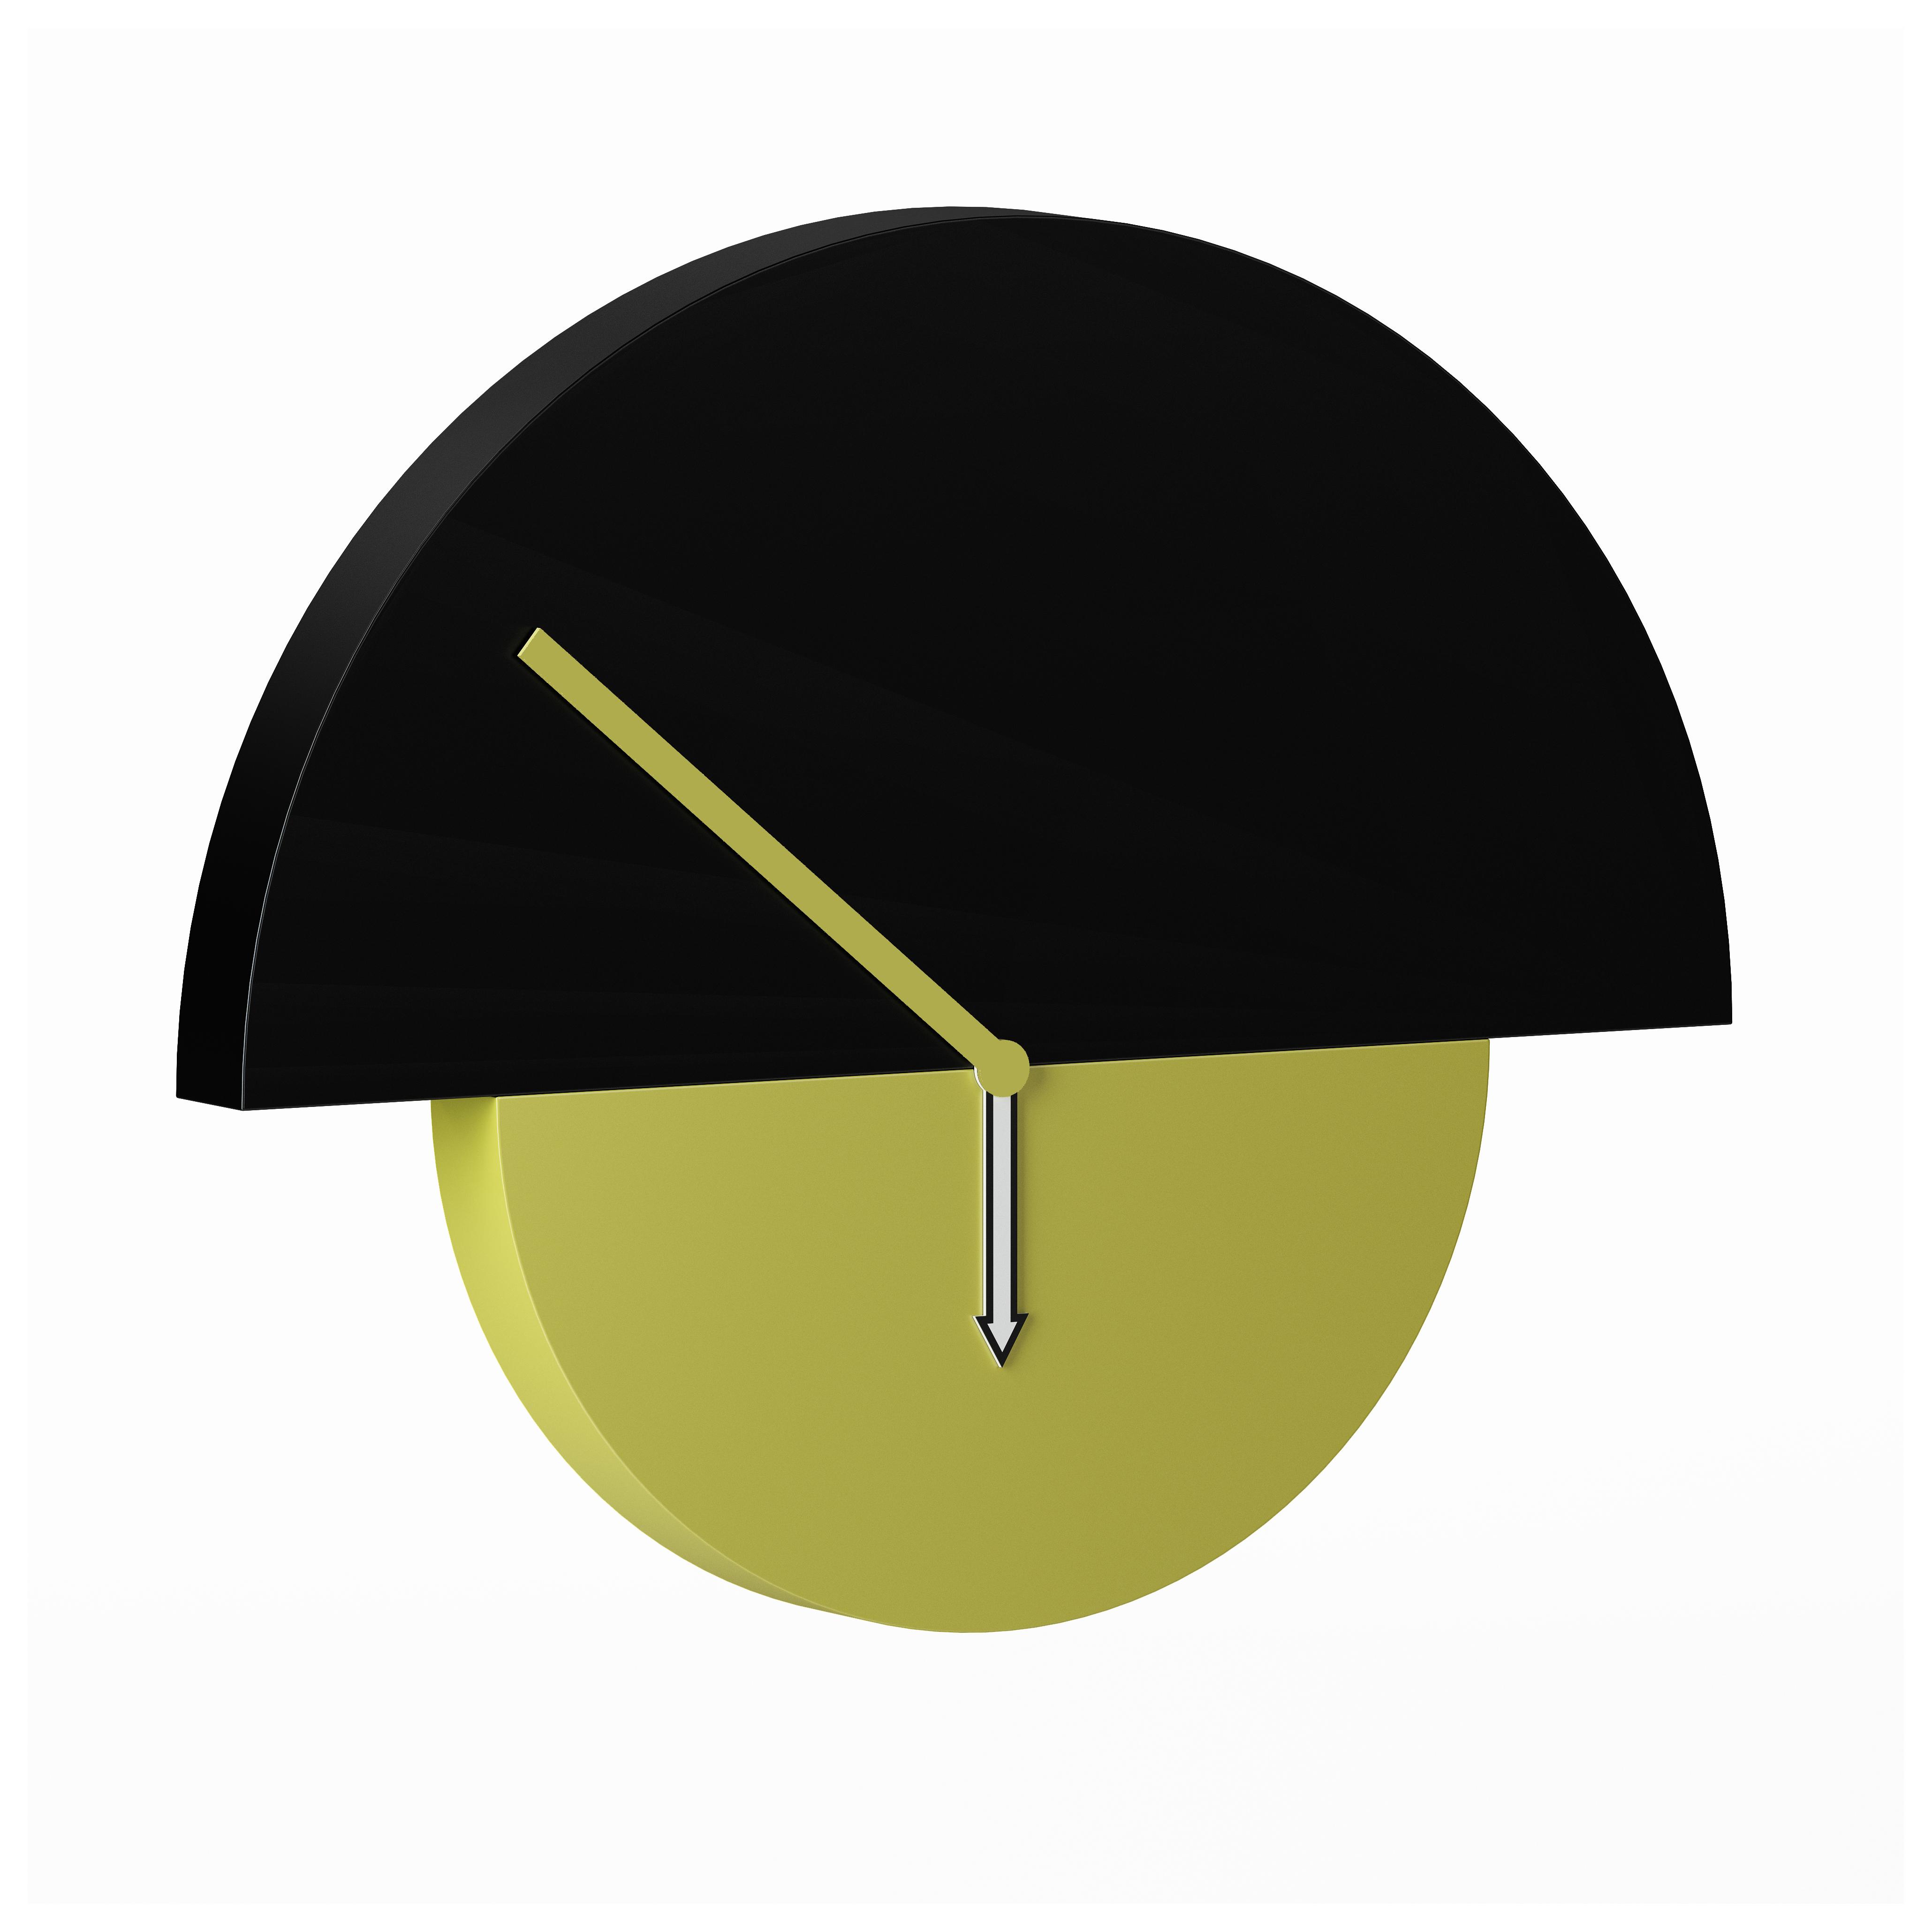 moon's hat